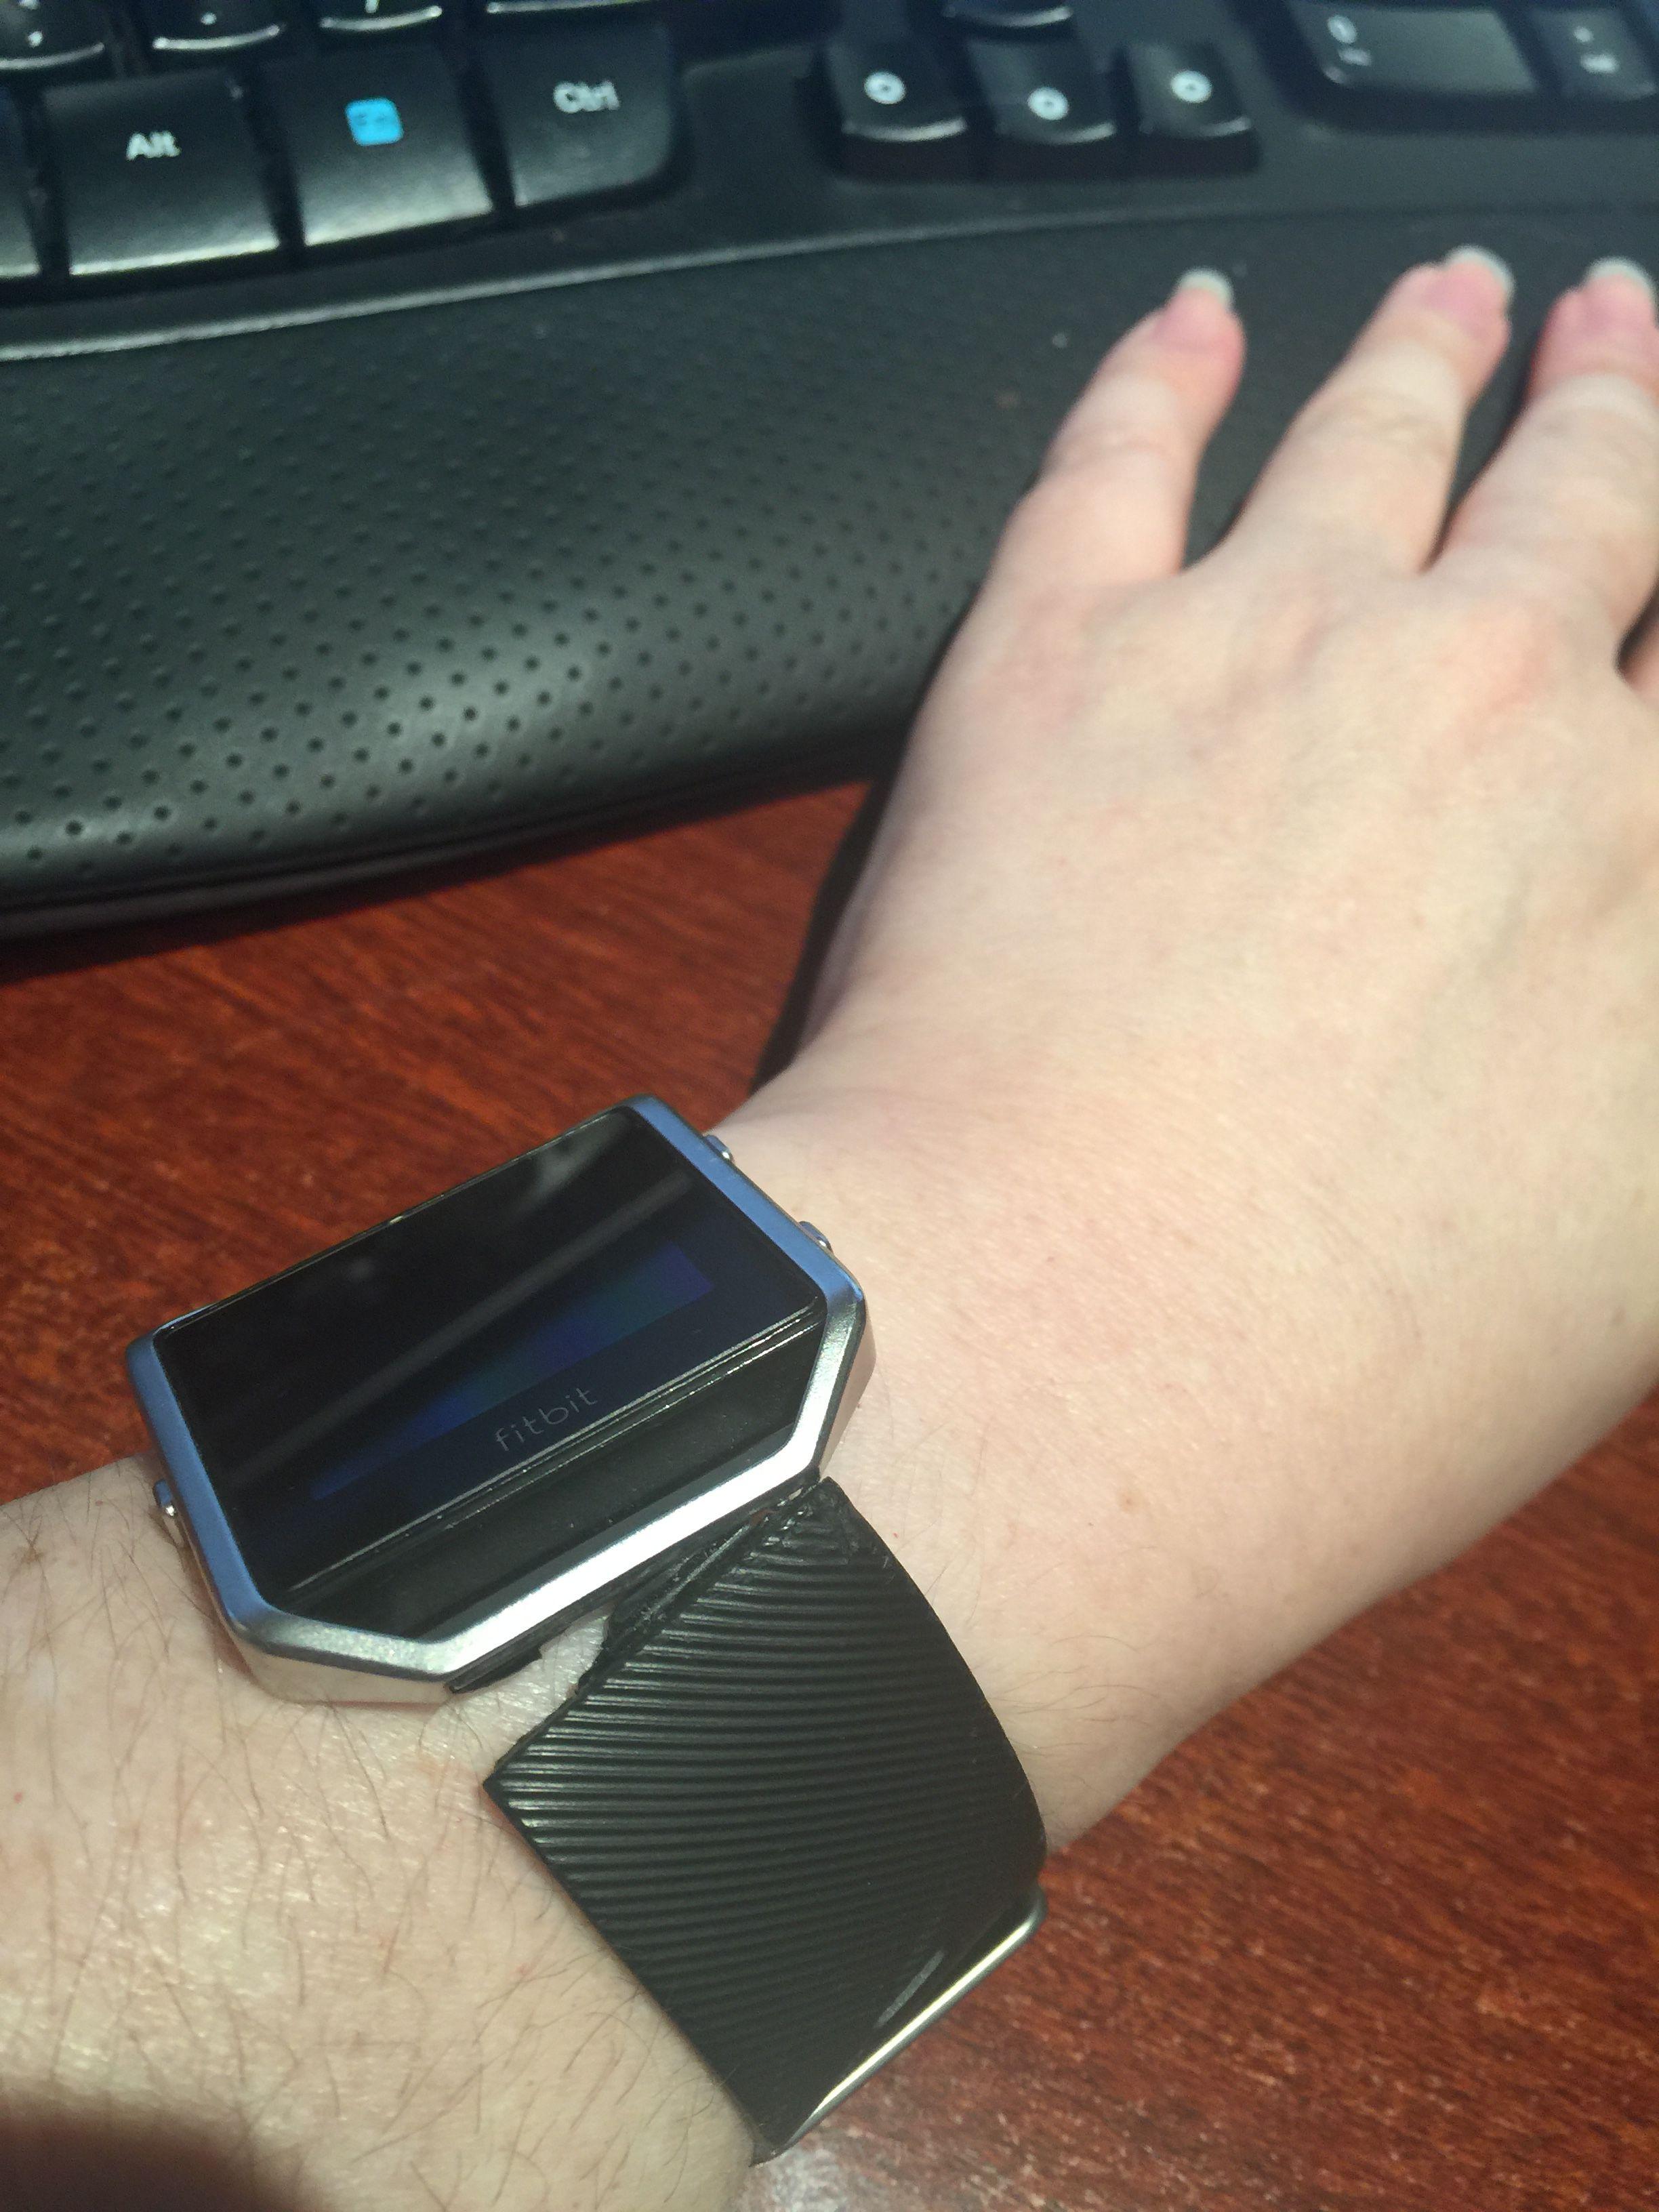 Blaze wrist band broken - Fitbit Community